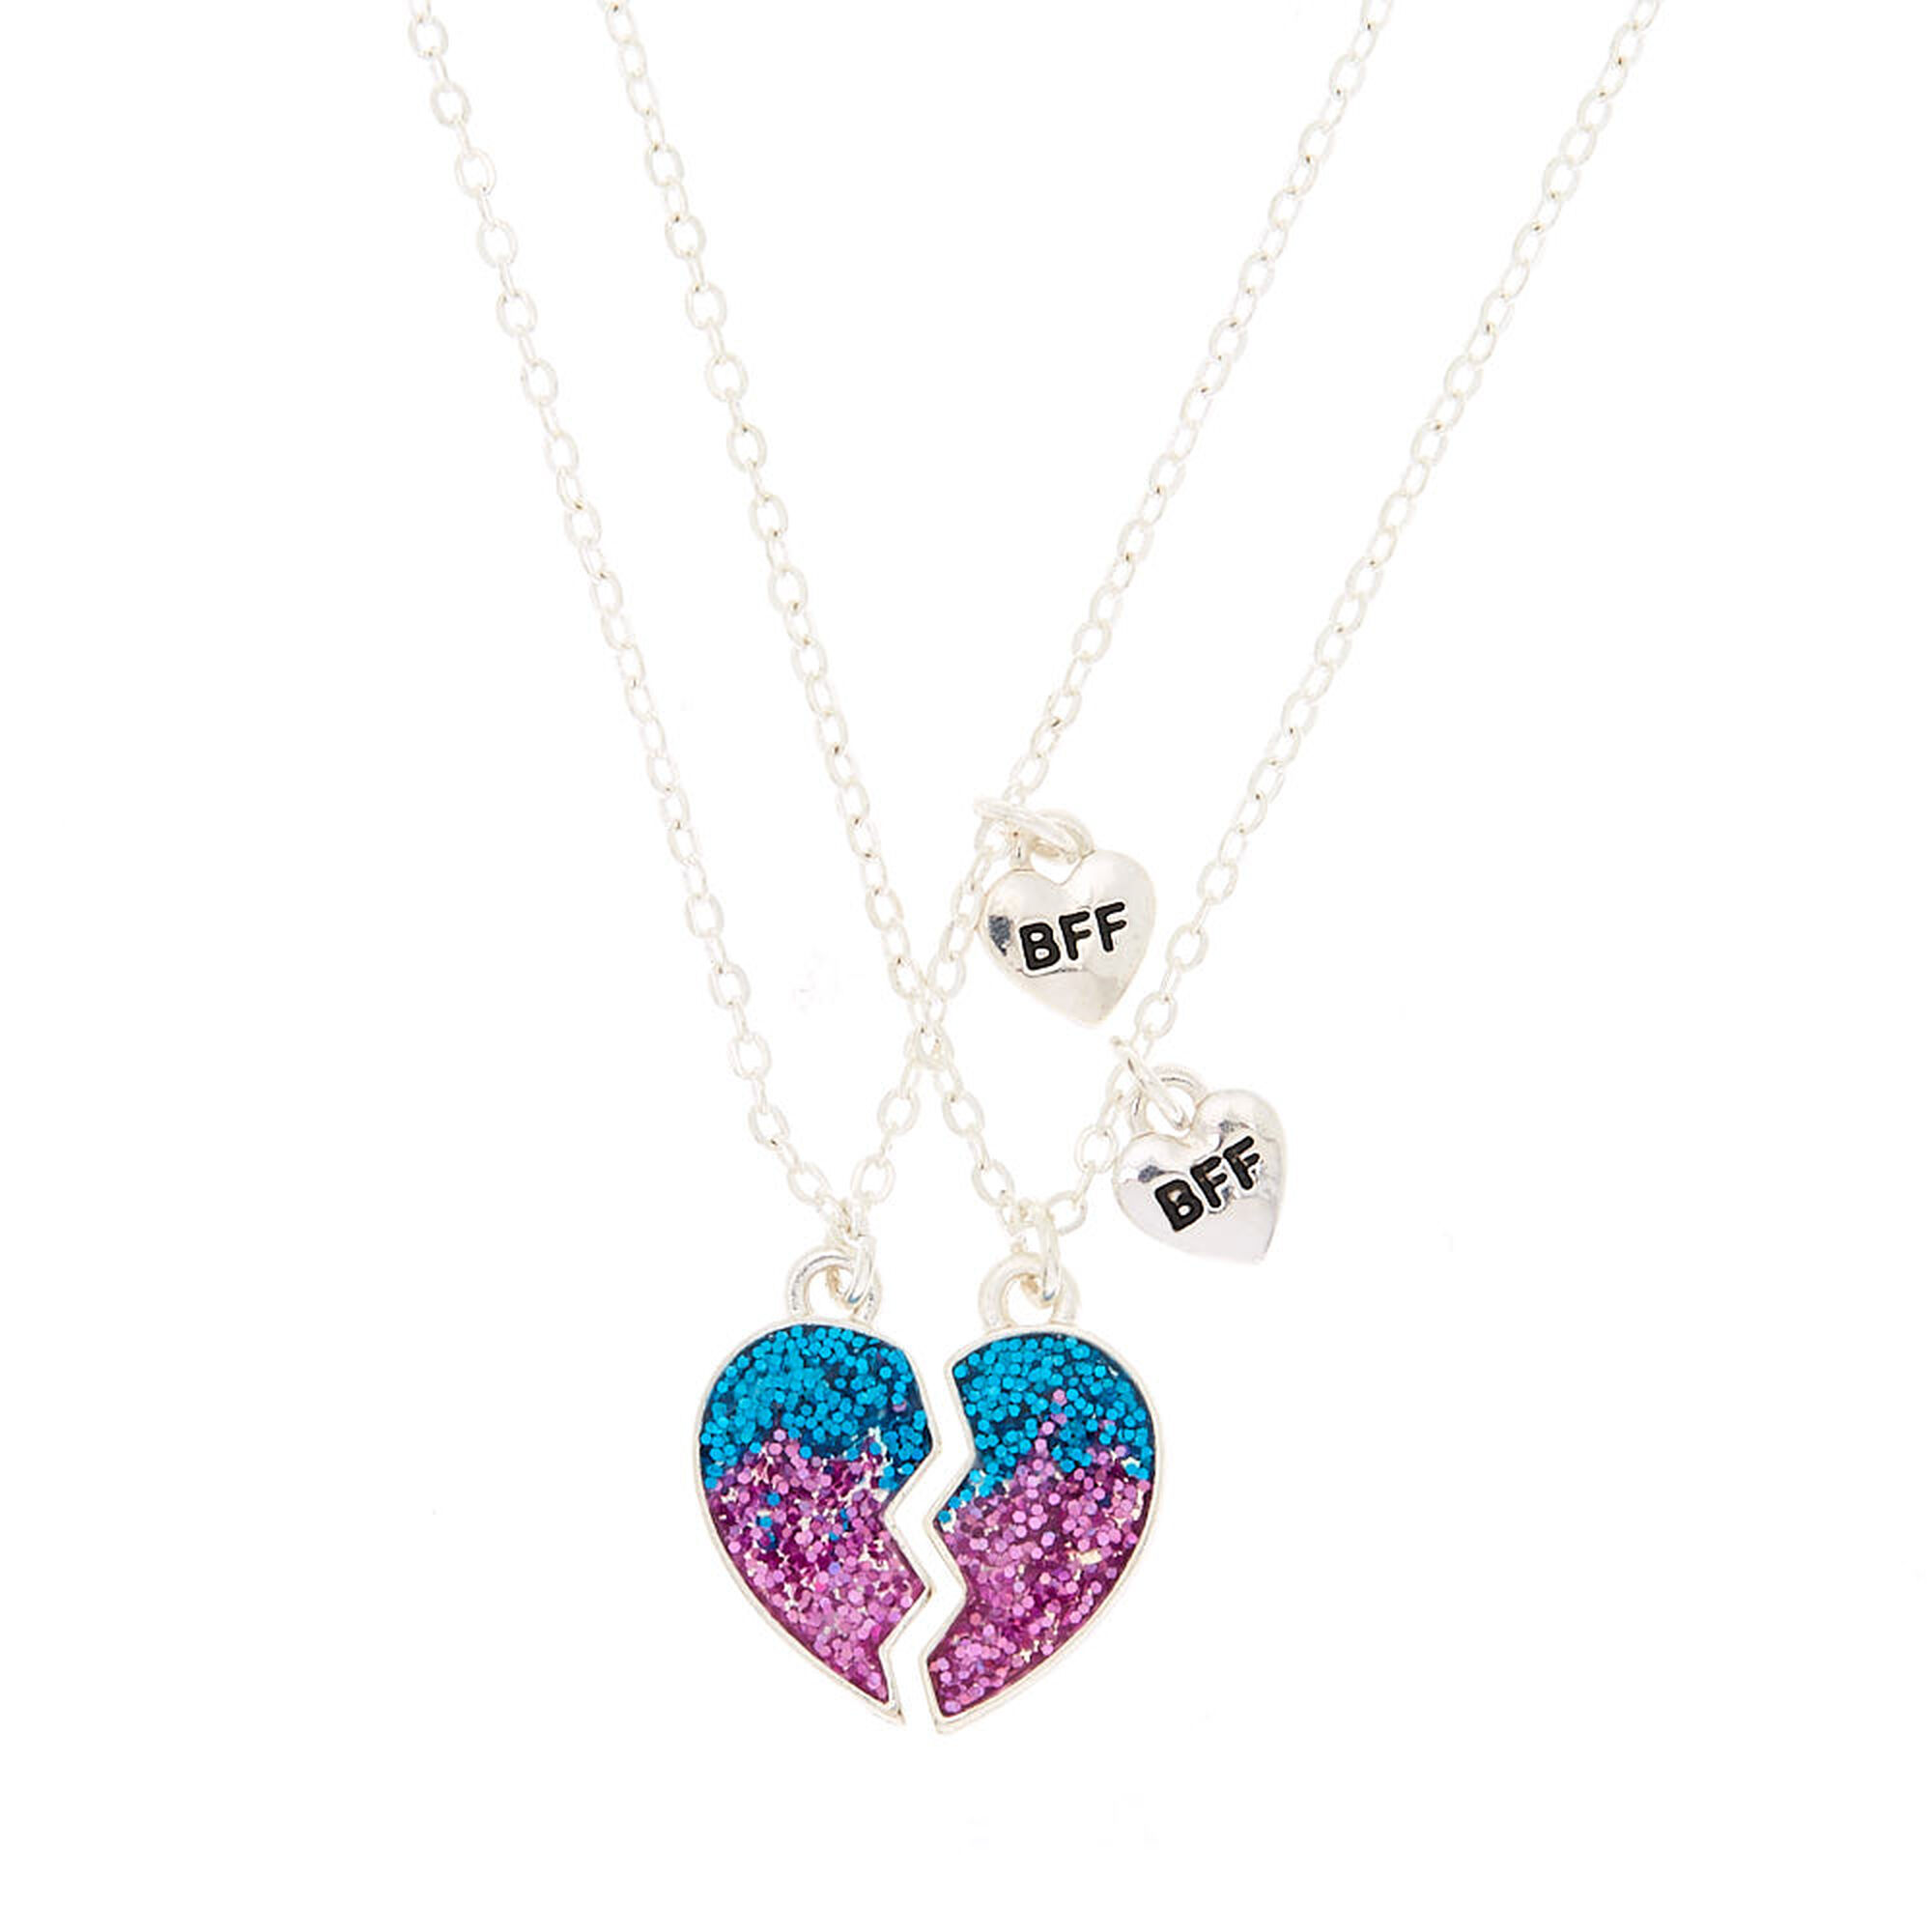 c0208a5b88f Best Friends Ombre Glitter Heart Pendant Necklaces - 2 Pack